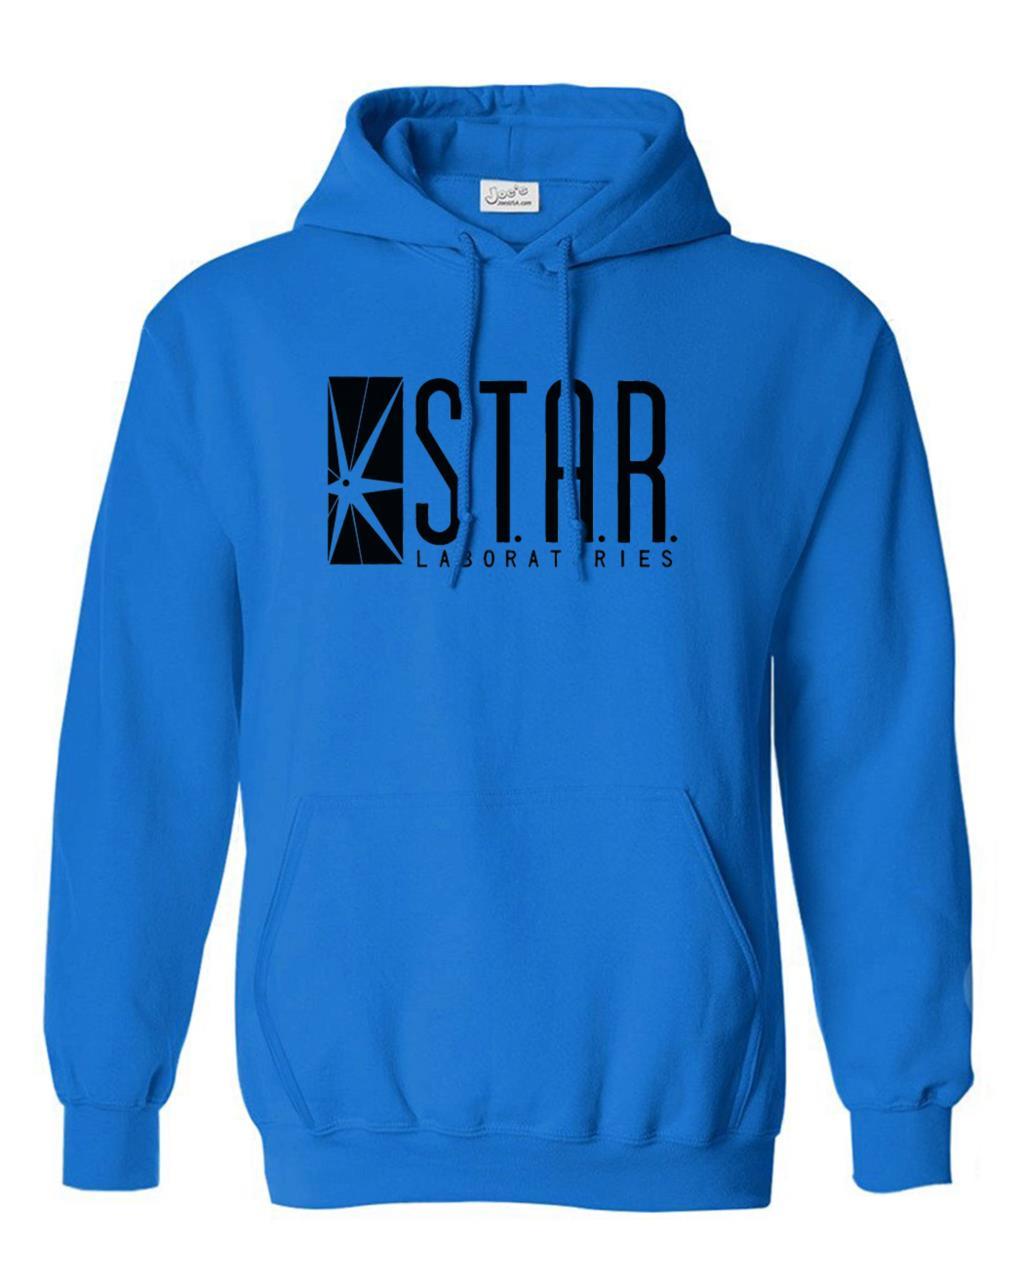 autumn brand hoodies superman series men hoody STAR S.T.A.R.labs jumper the flash gotham city comic books black sweatshirt 3